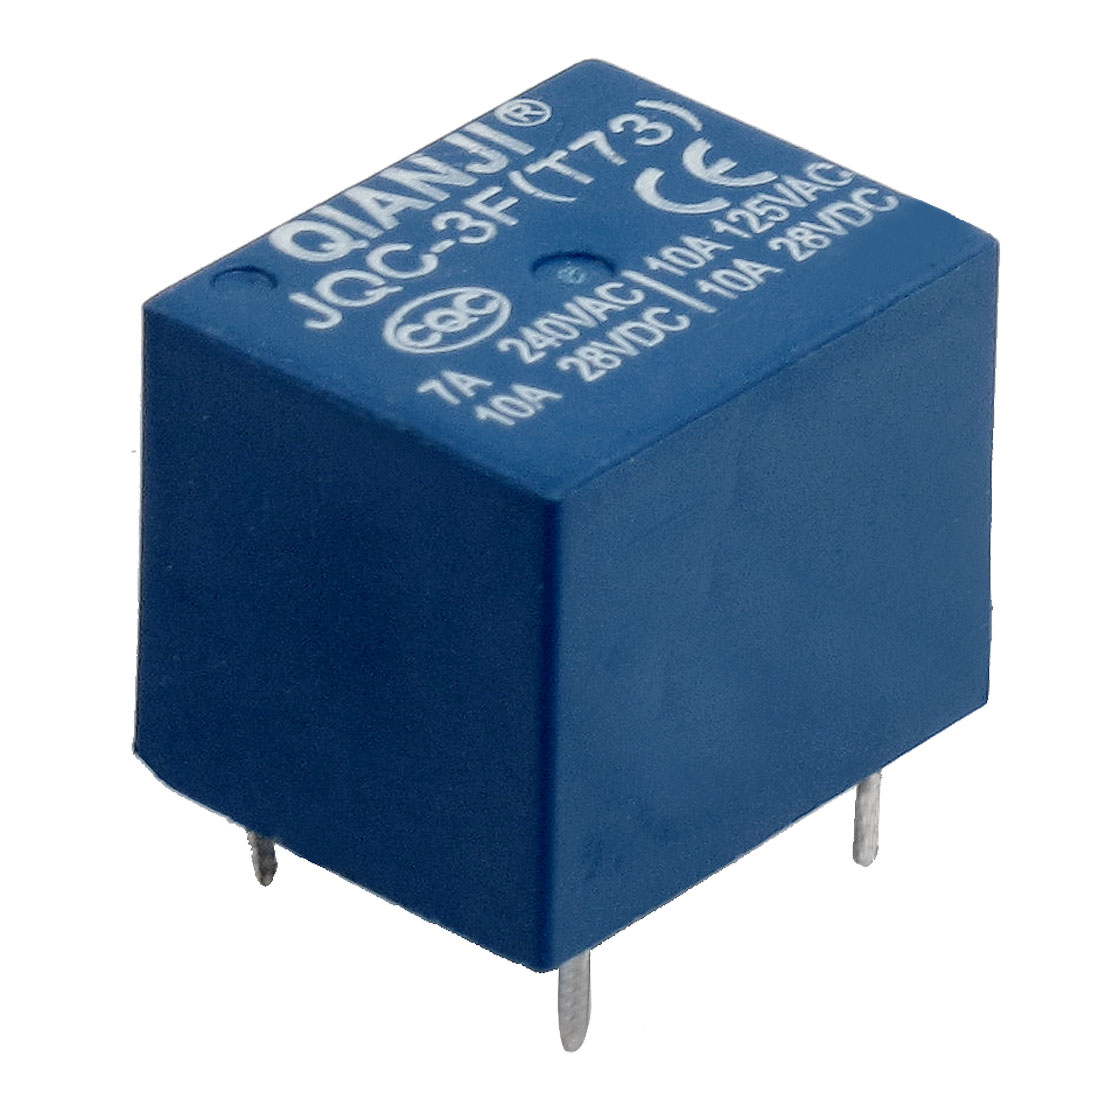 JOC-3F(T73) DC 12V Coil 5 Pin AC 125V/240V DC 28V Power Relay